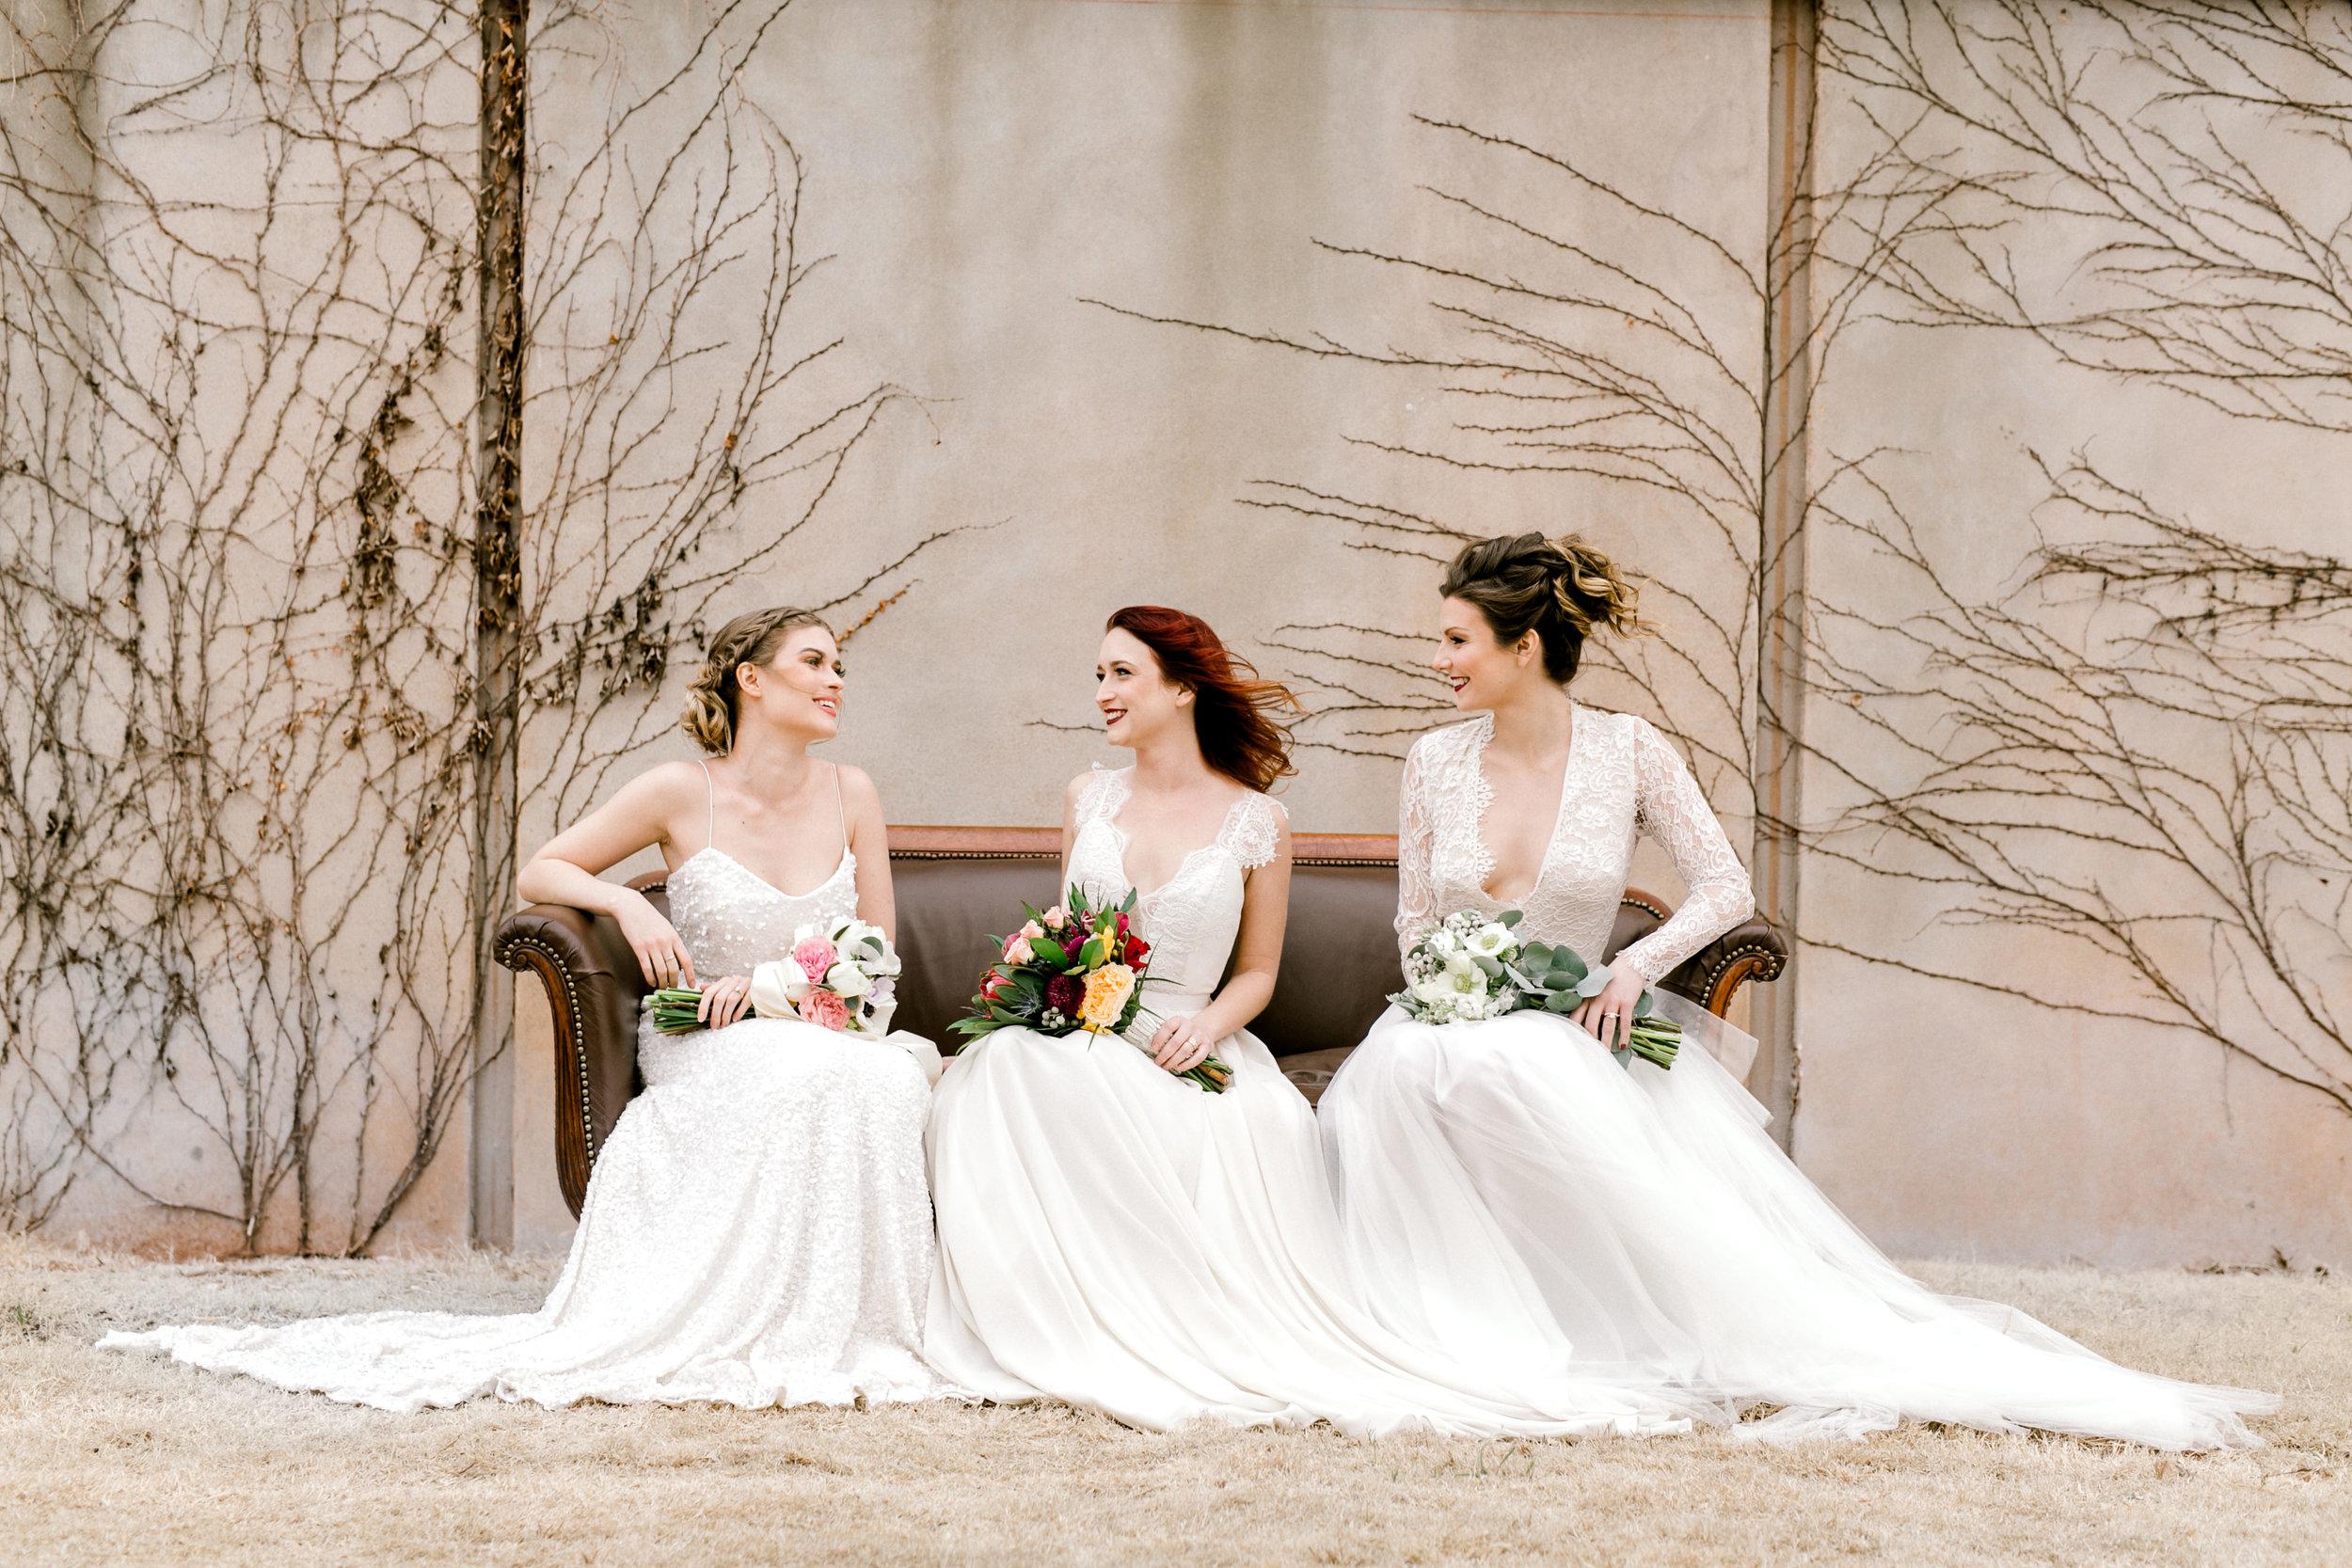 The-Baumberhof-_-Wedding-Pictures-_-Edmond-OK-_-by-oklahoma-wedding-photographer-Emily-Nicole-Photo-89.jpg